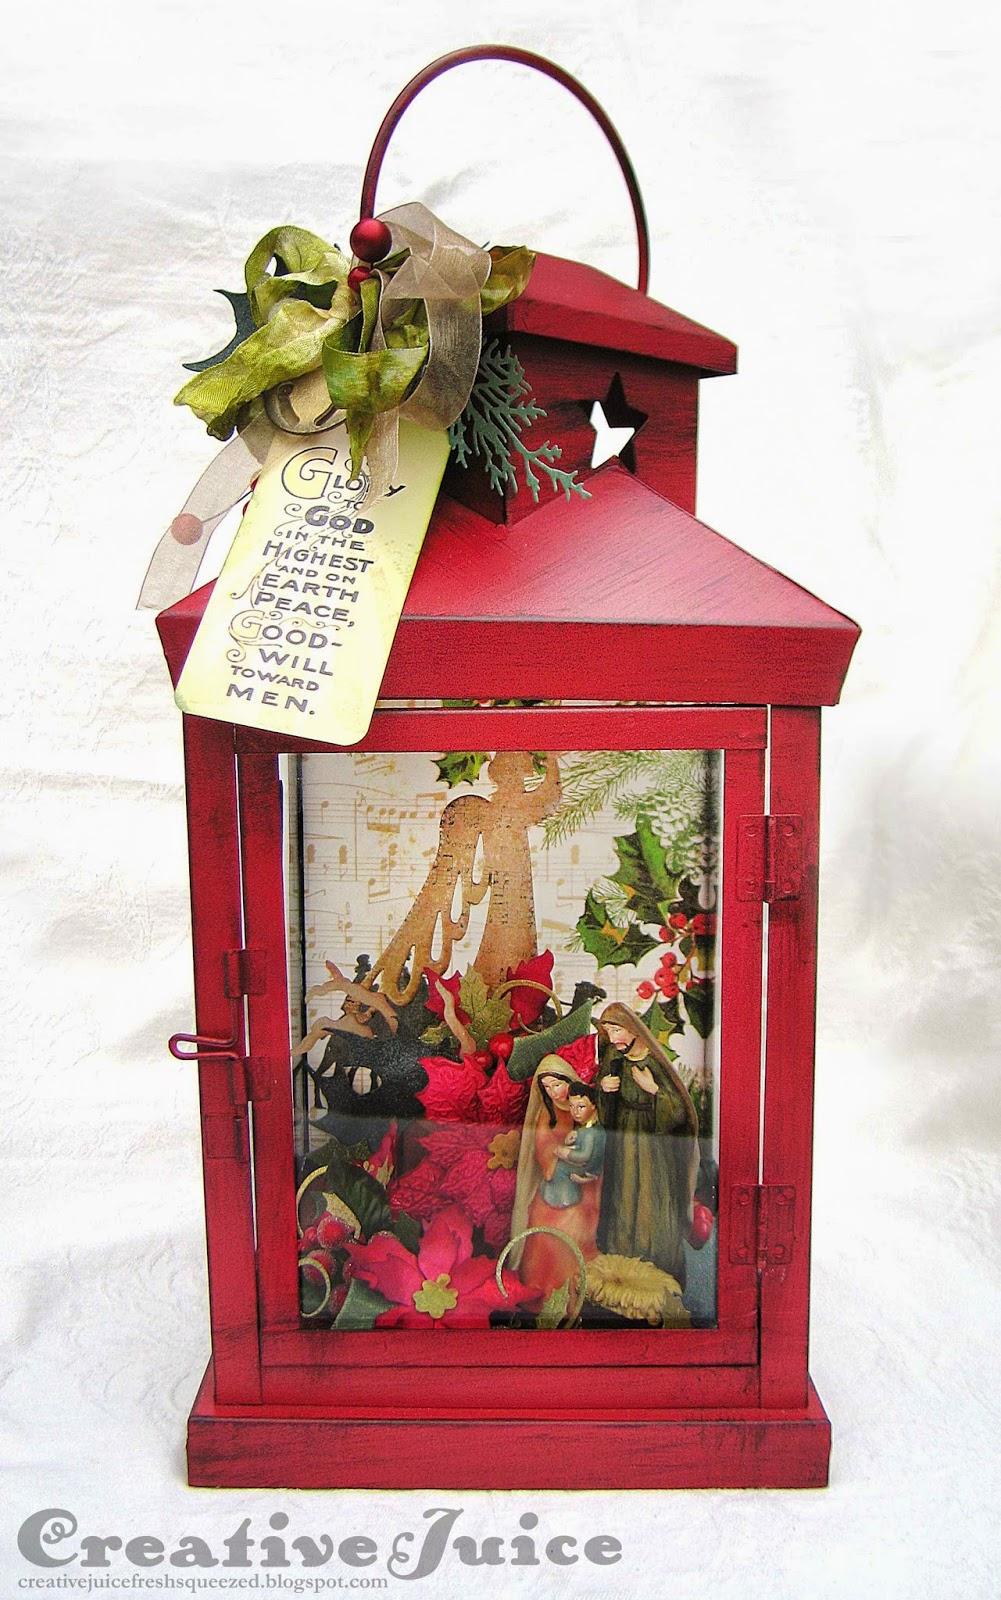 Creative Juice: Christmas Nativity Lantern